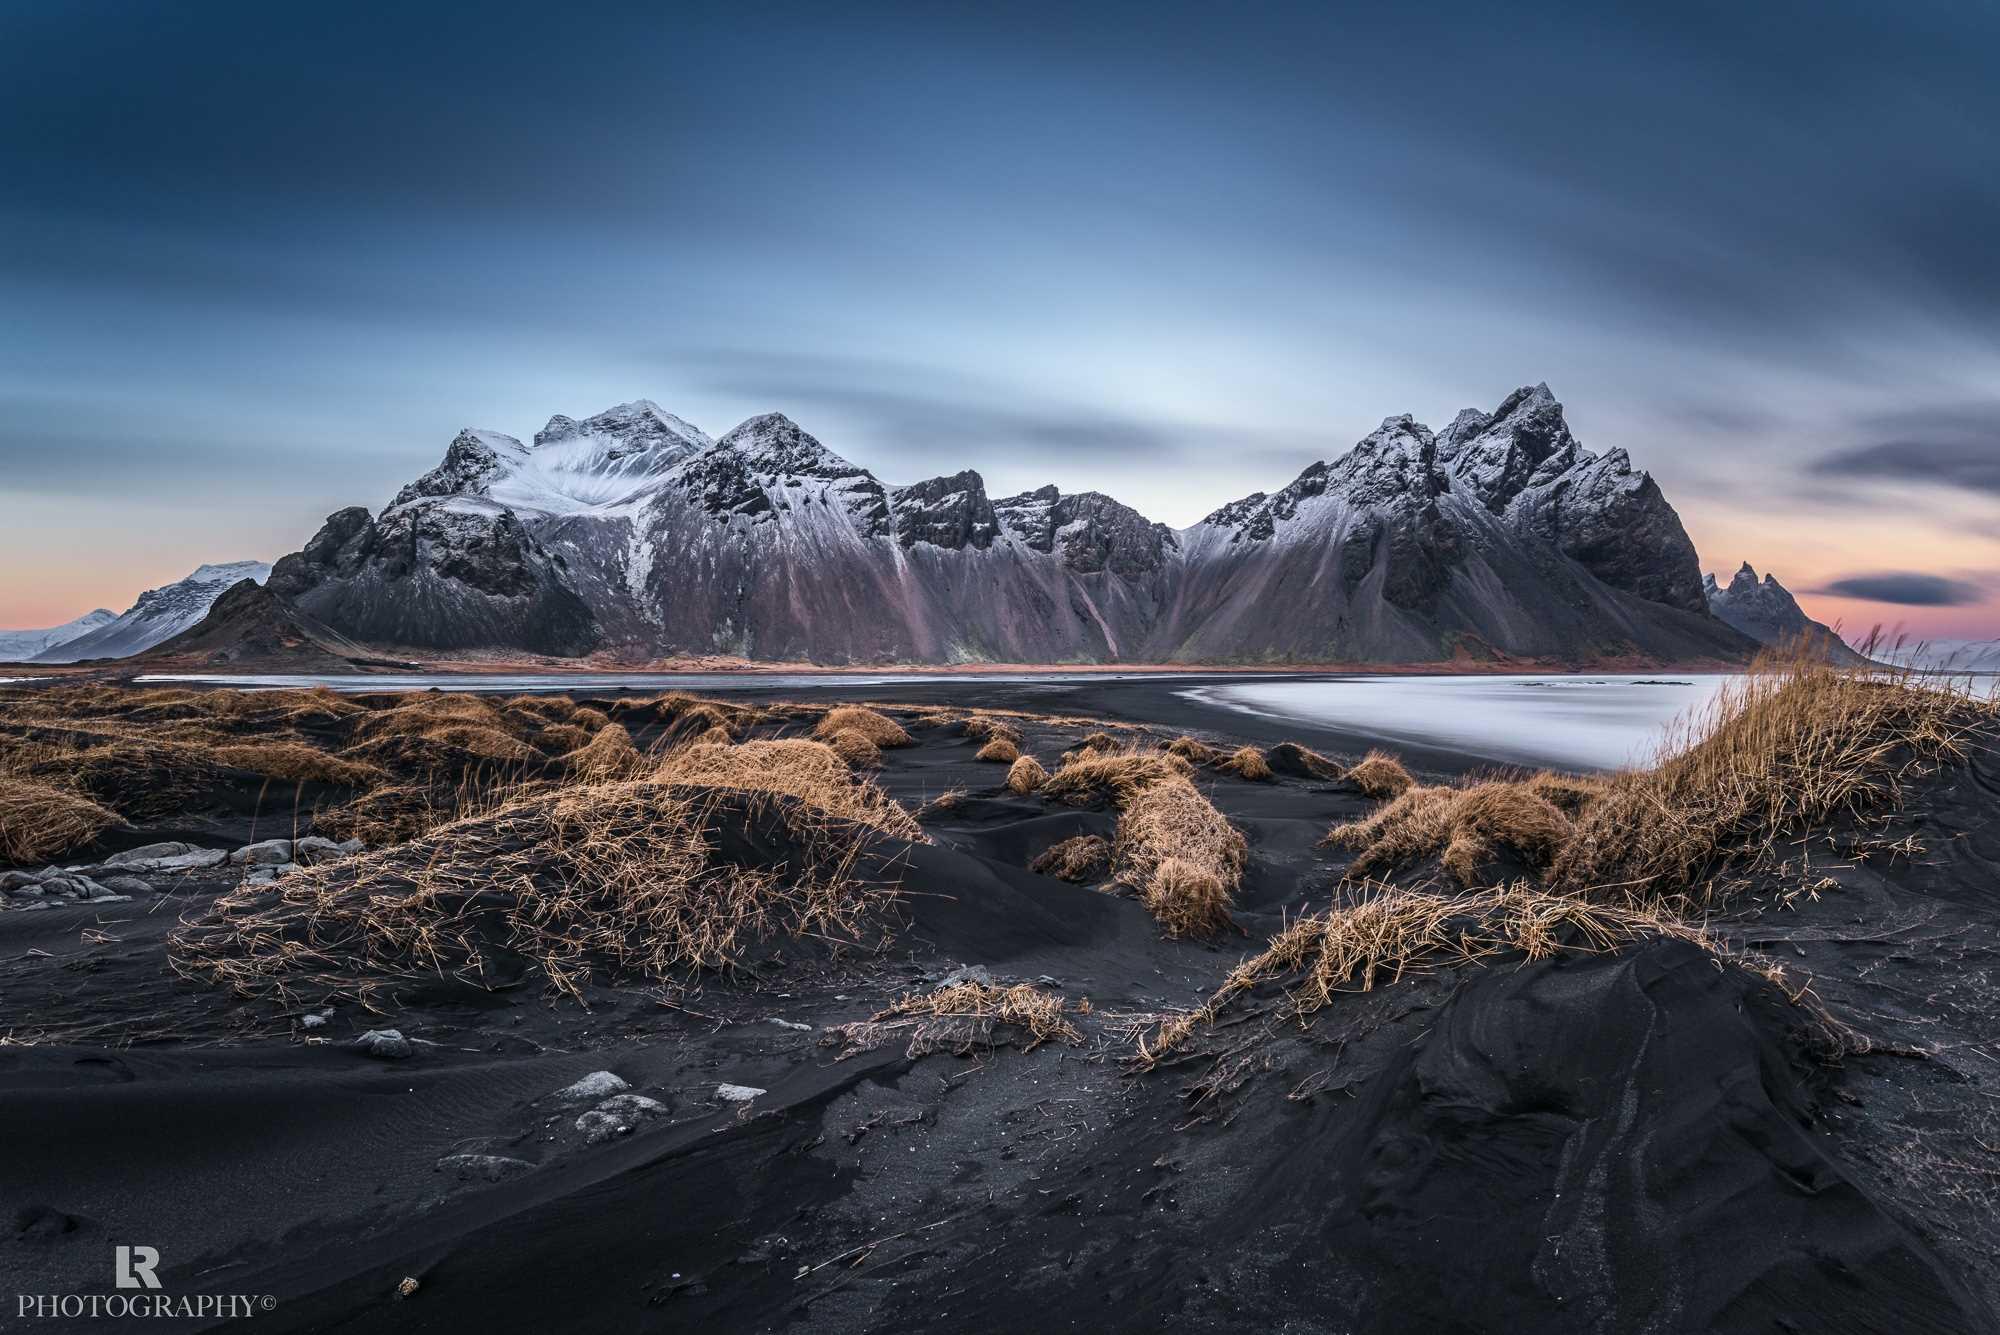 Landscape Photography by Lorenzo Riva